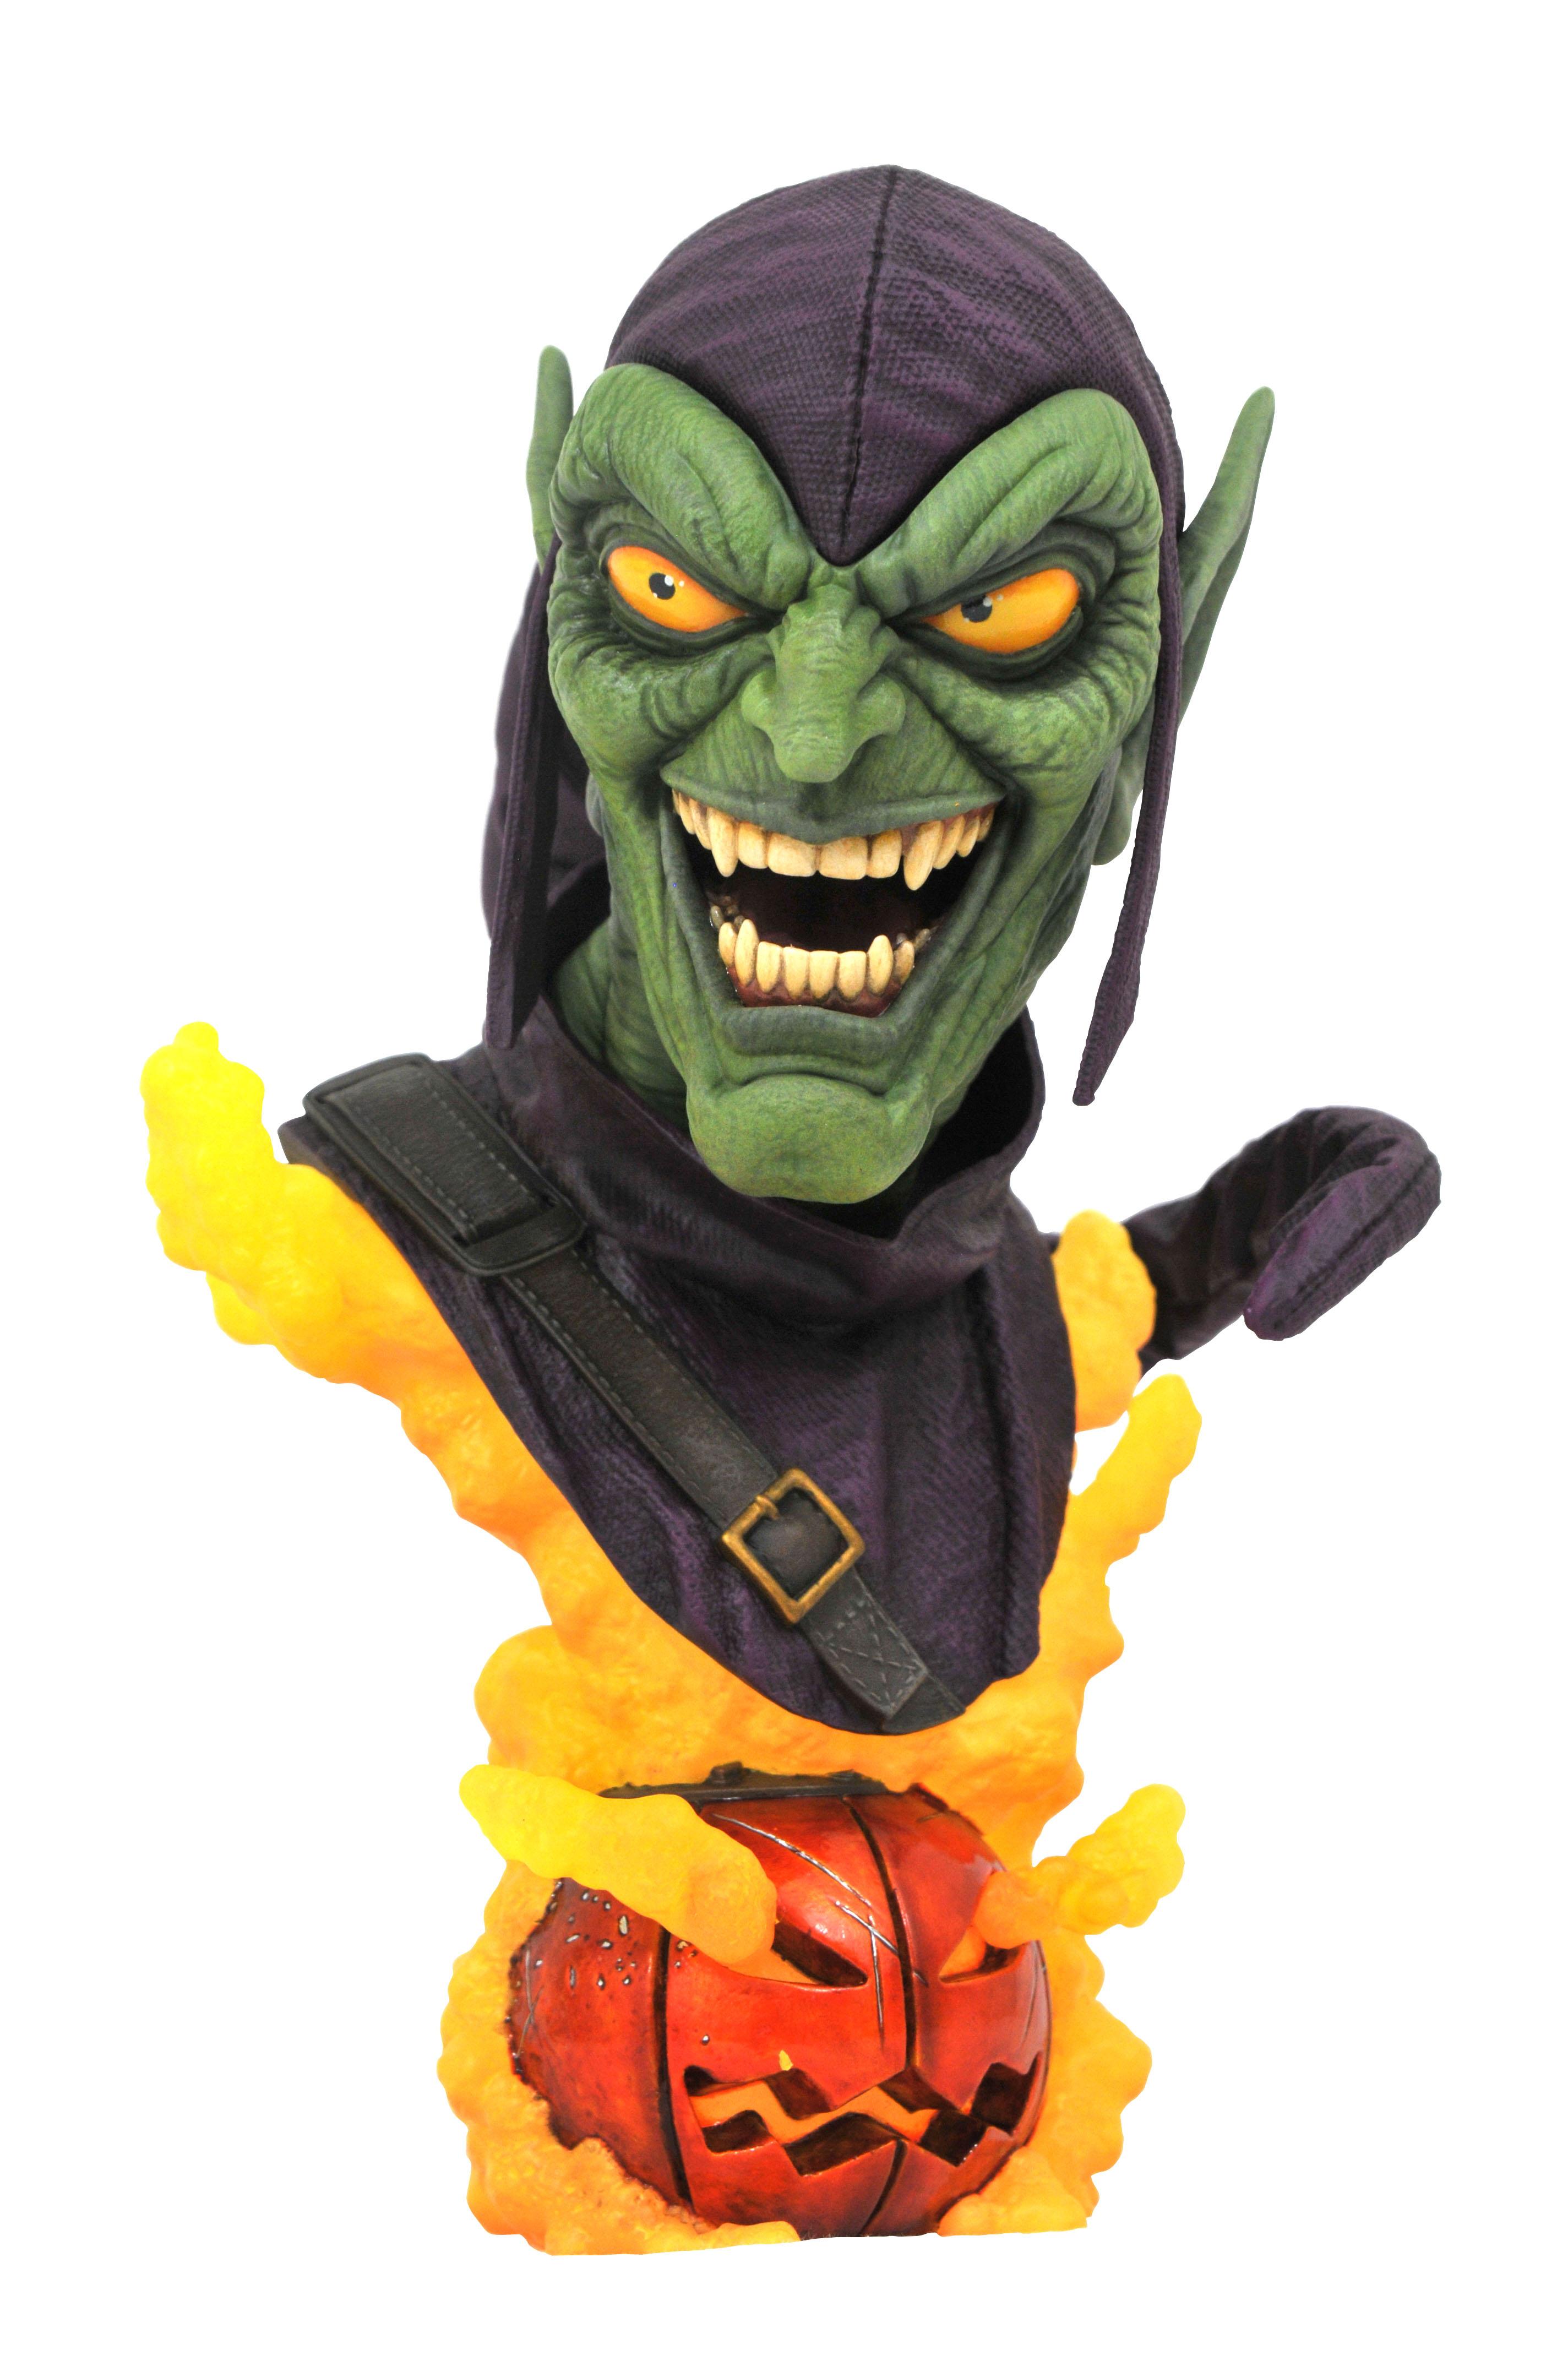 Green Goblin Legends in 3-Dimensions Bust